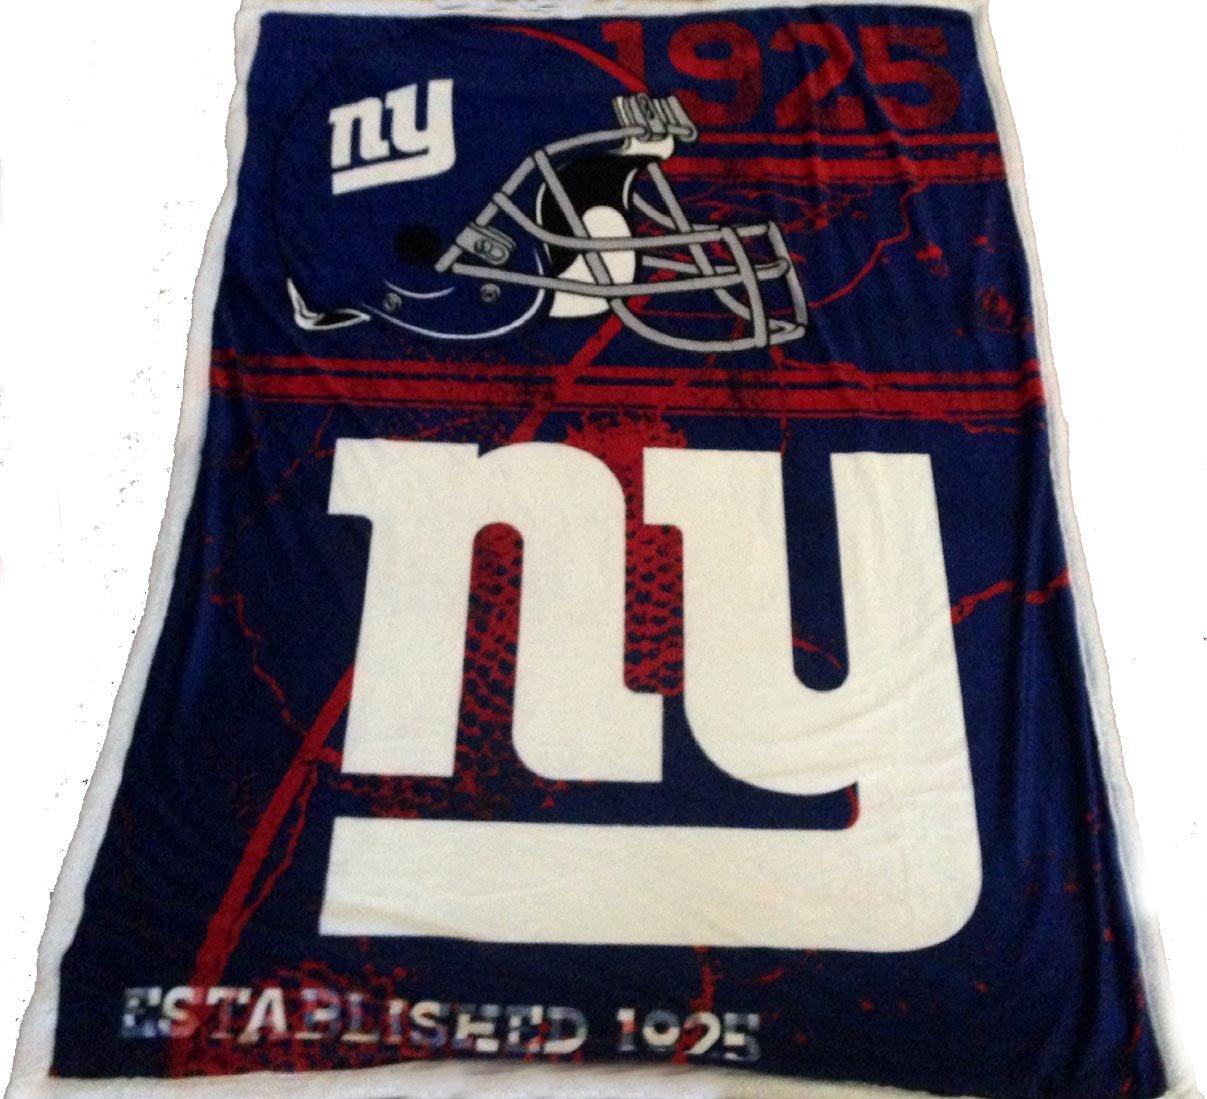 New York Giants Mink Sherpa Throw Blanket 60x80 NFL Giants Bedding by Northwest